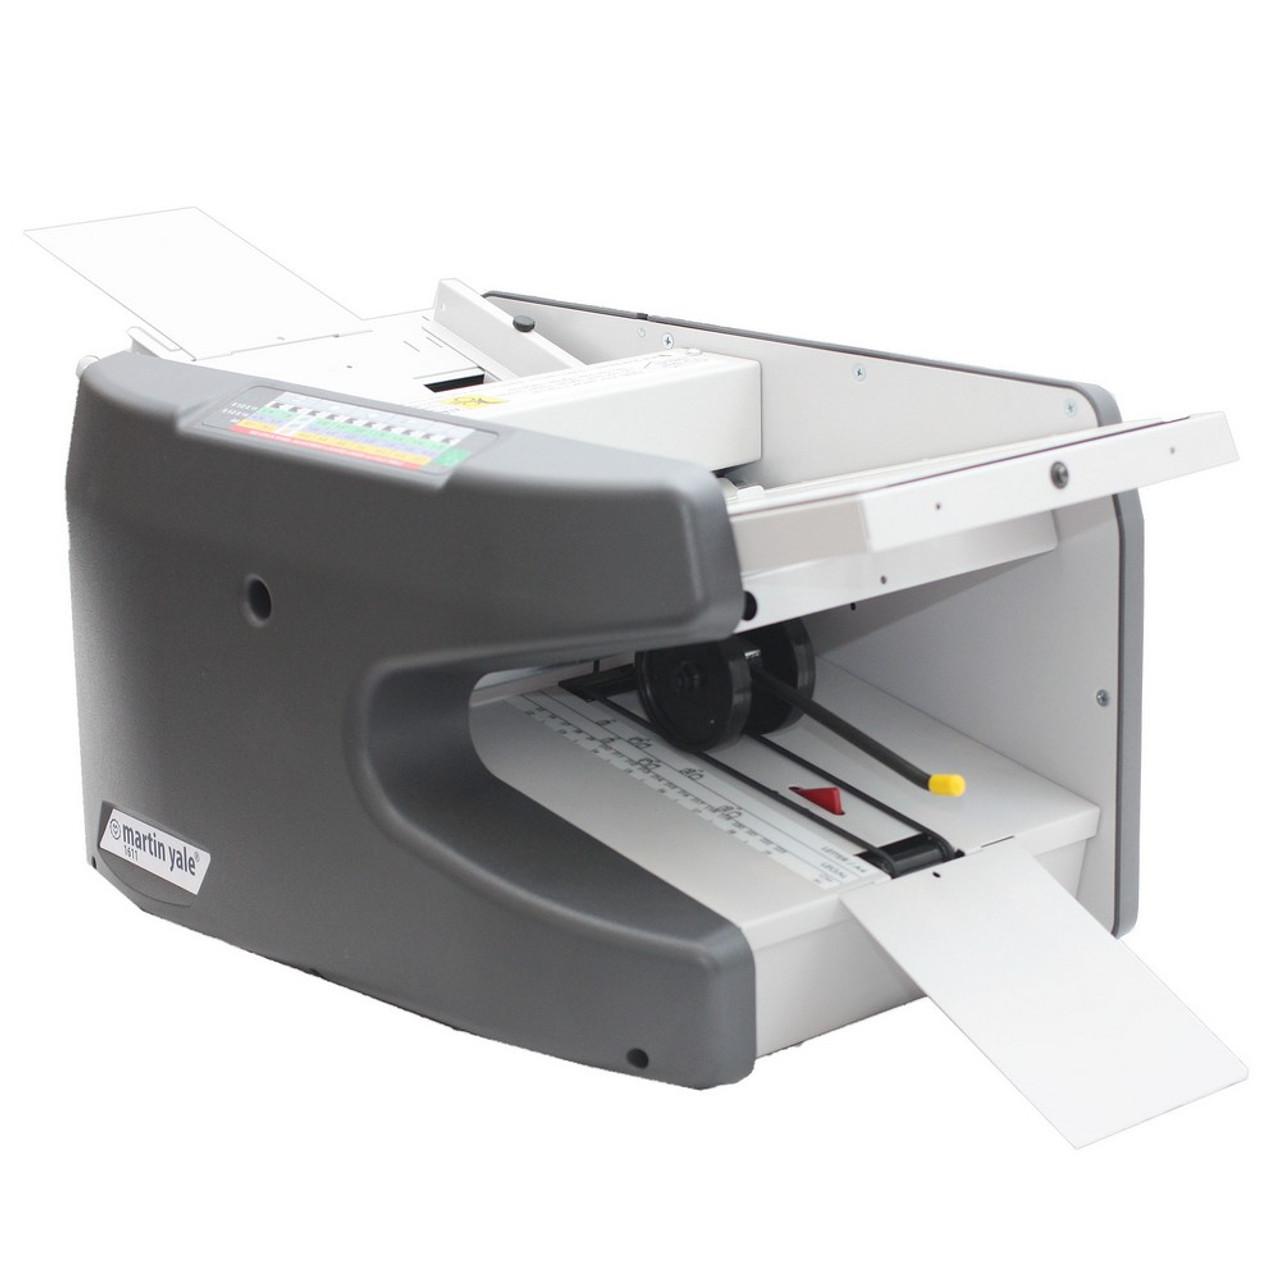 Martin Yale 1611 Autofolder  Paper Folding Machine